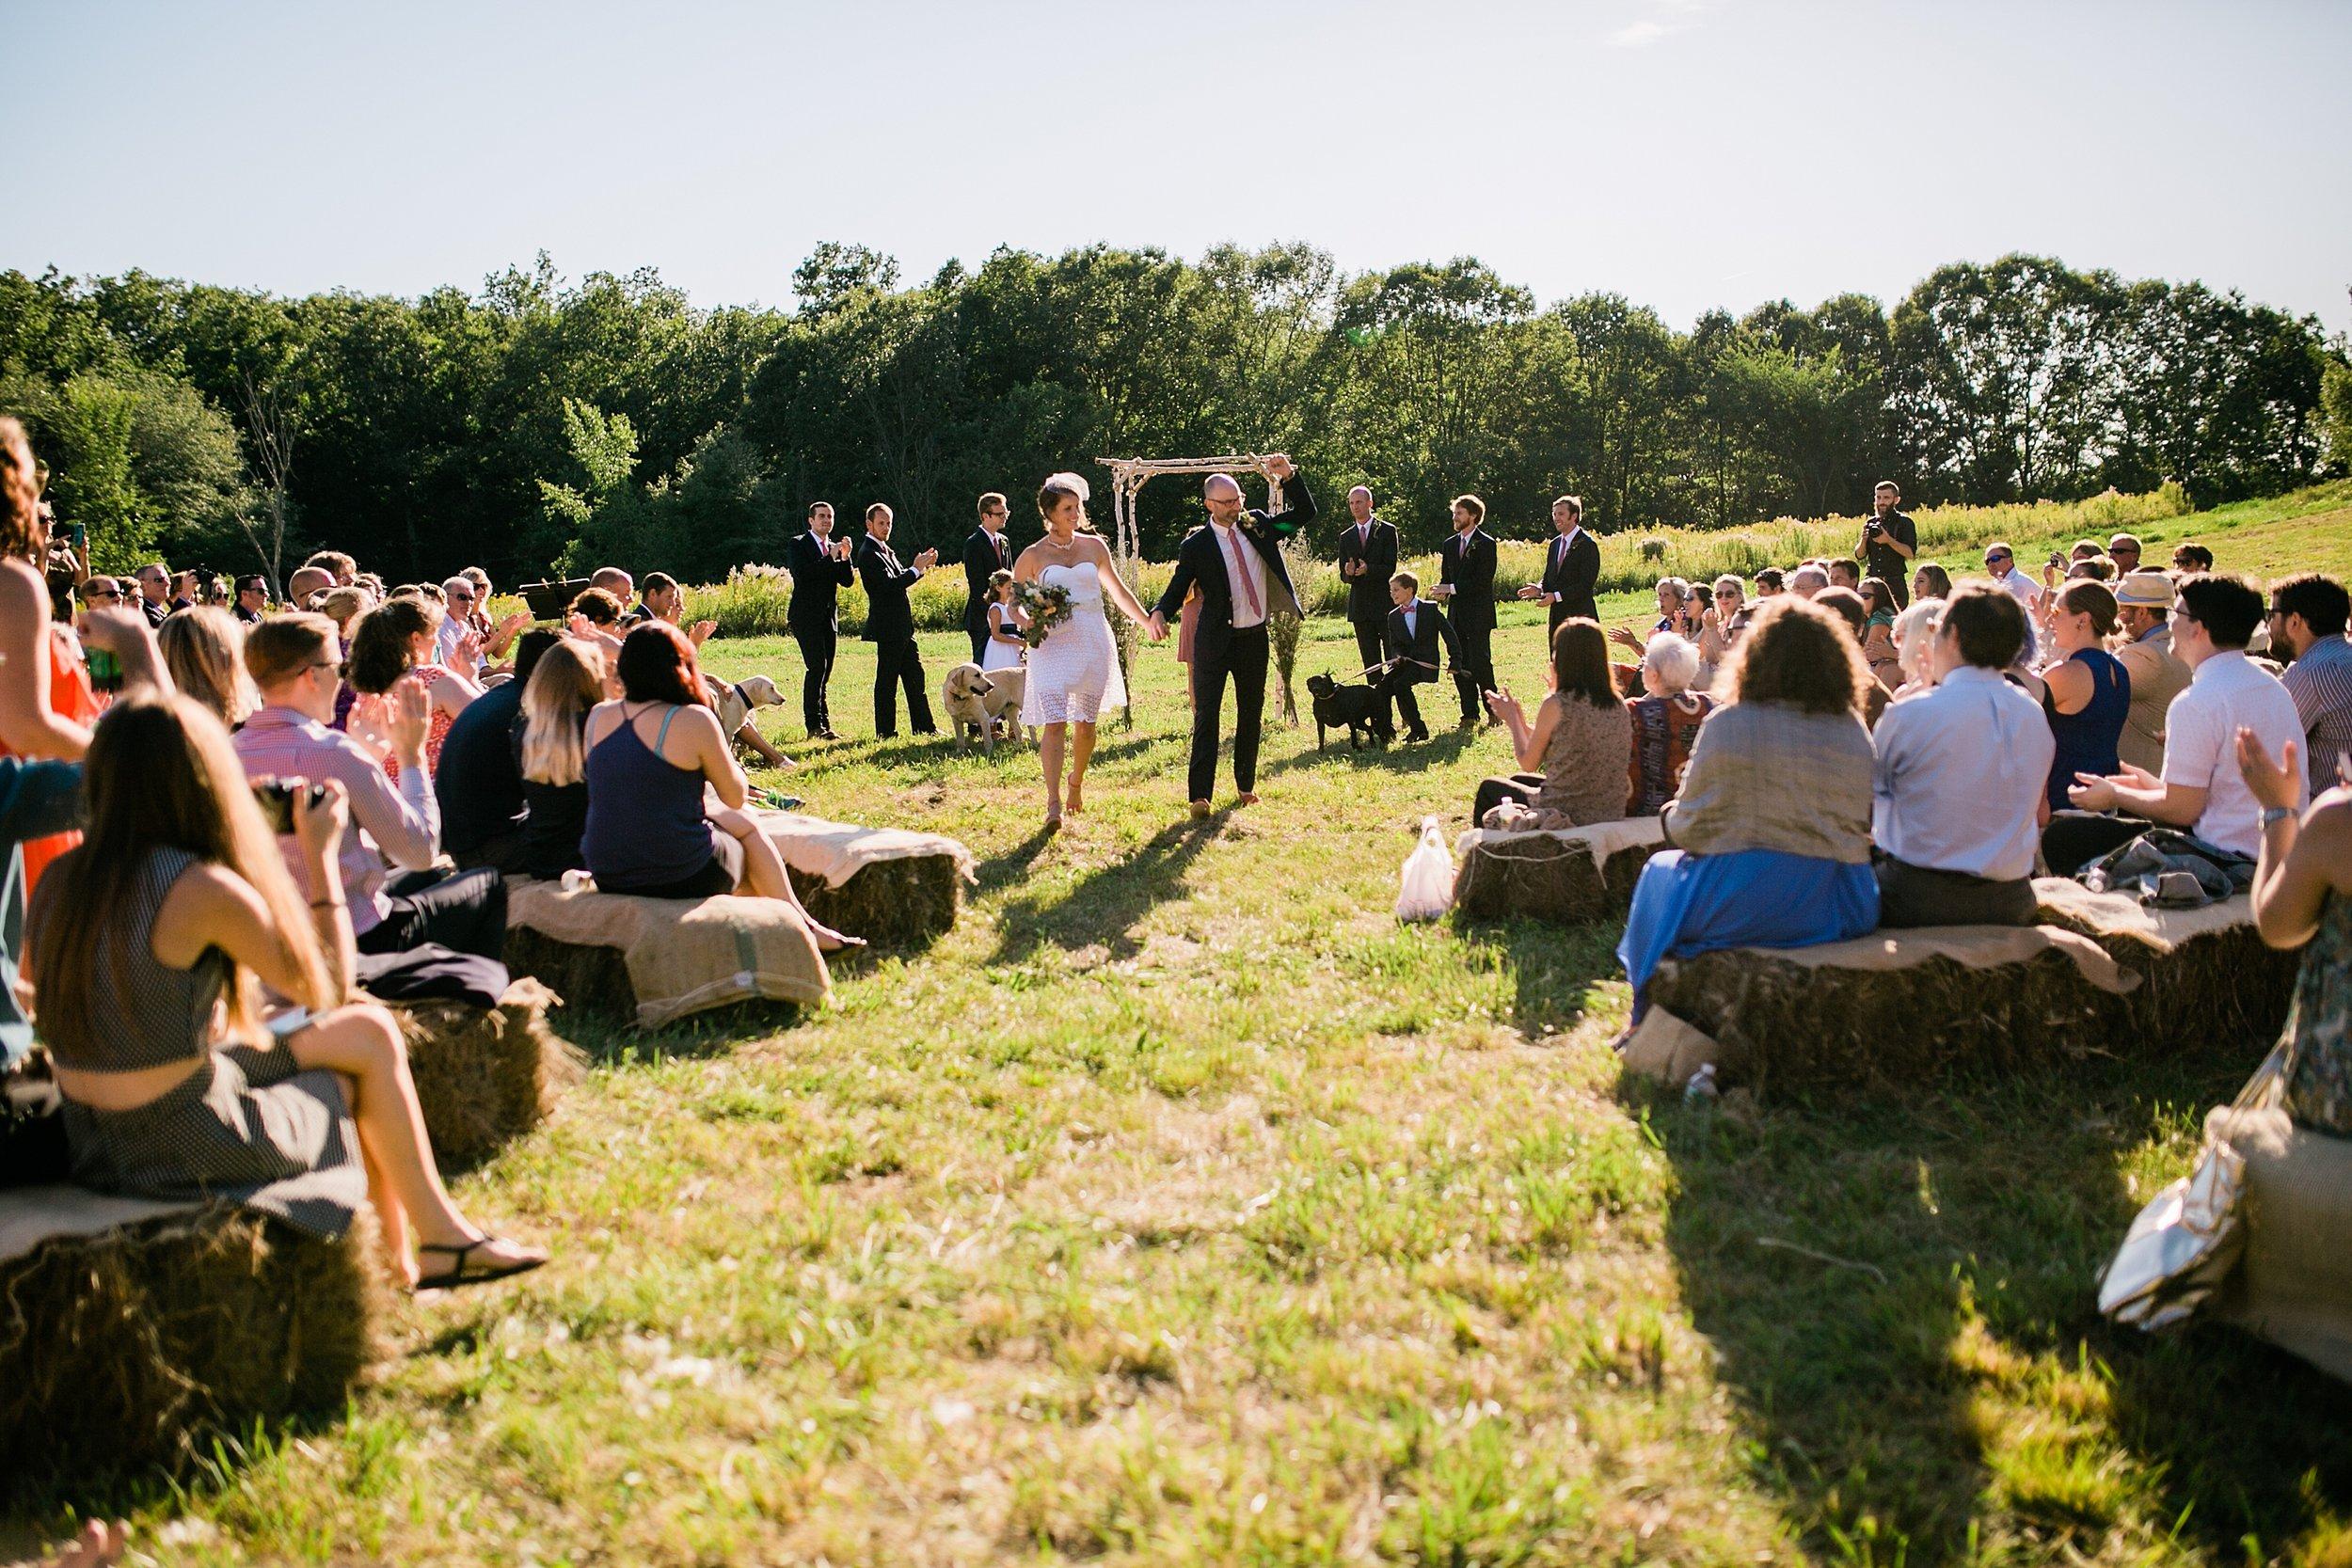 050 los angeles wedding photographer.jpg